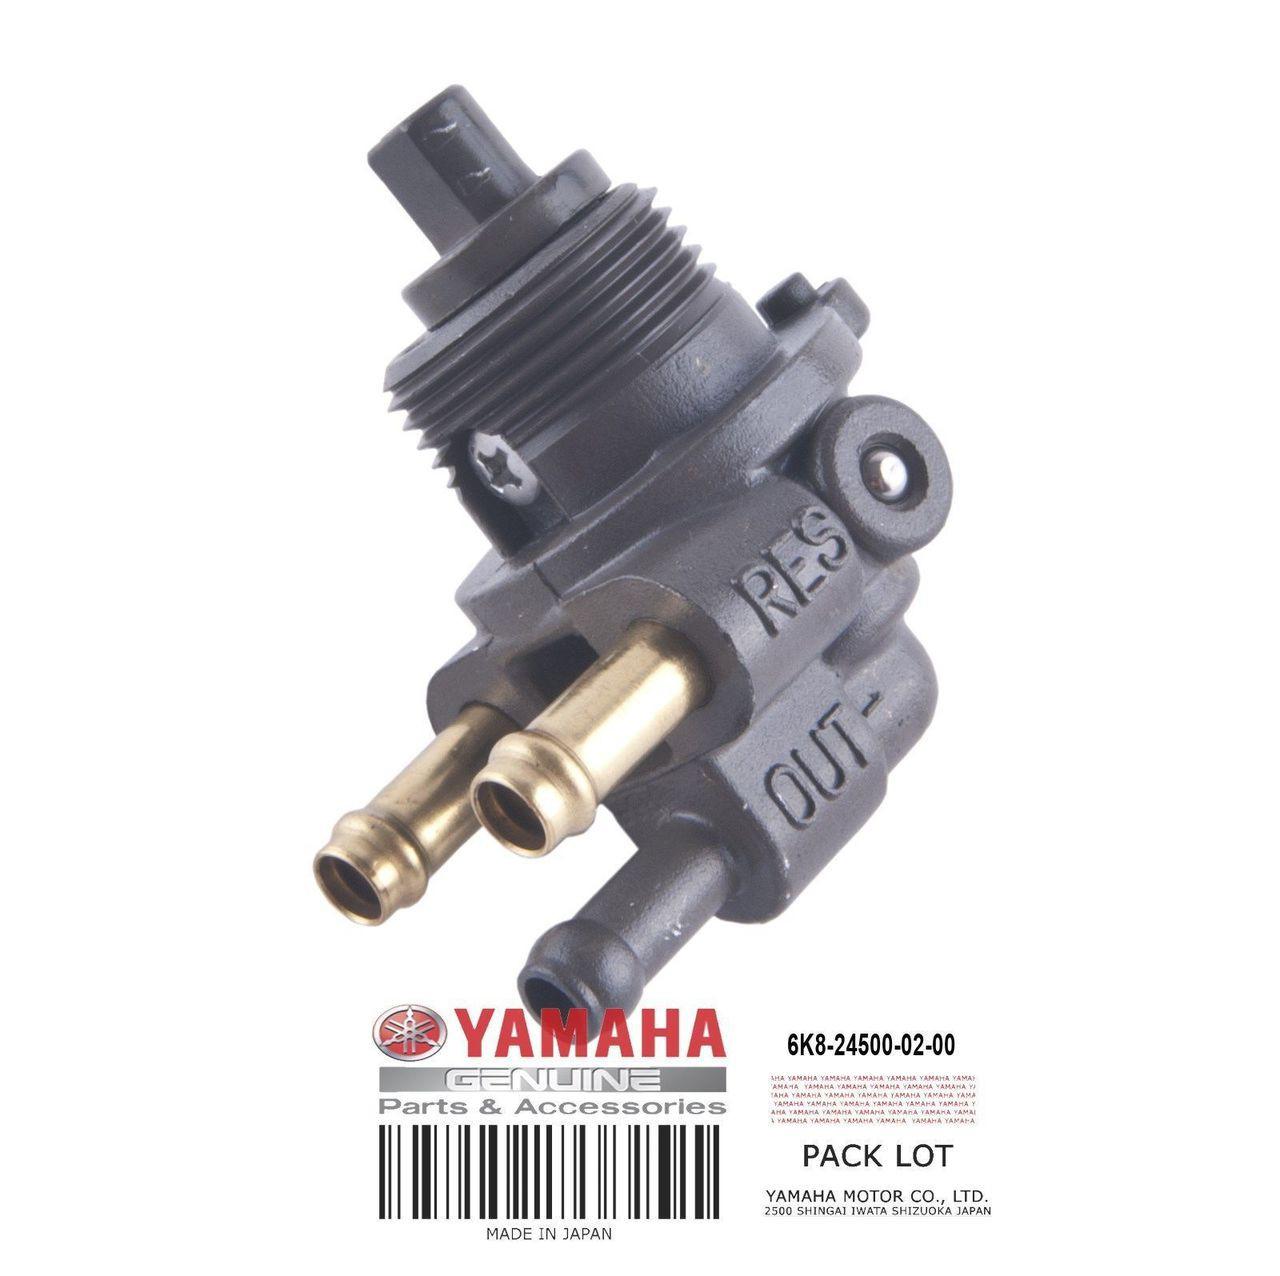 YAMAHA OEM Fuel Cock Assembly 6K8-24500-02-00 1987-2017 FX VX Jammer Raider  Runner SJ